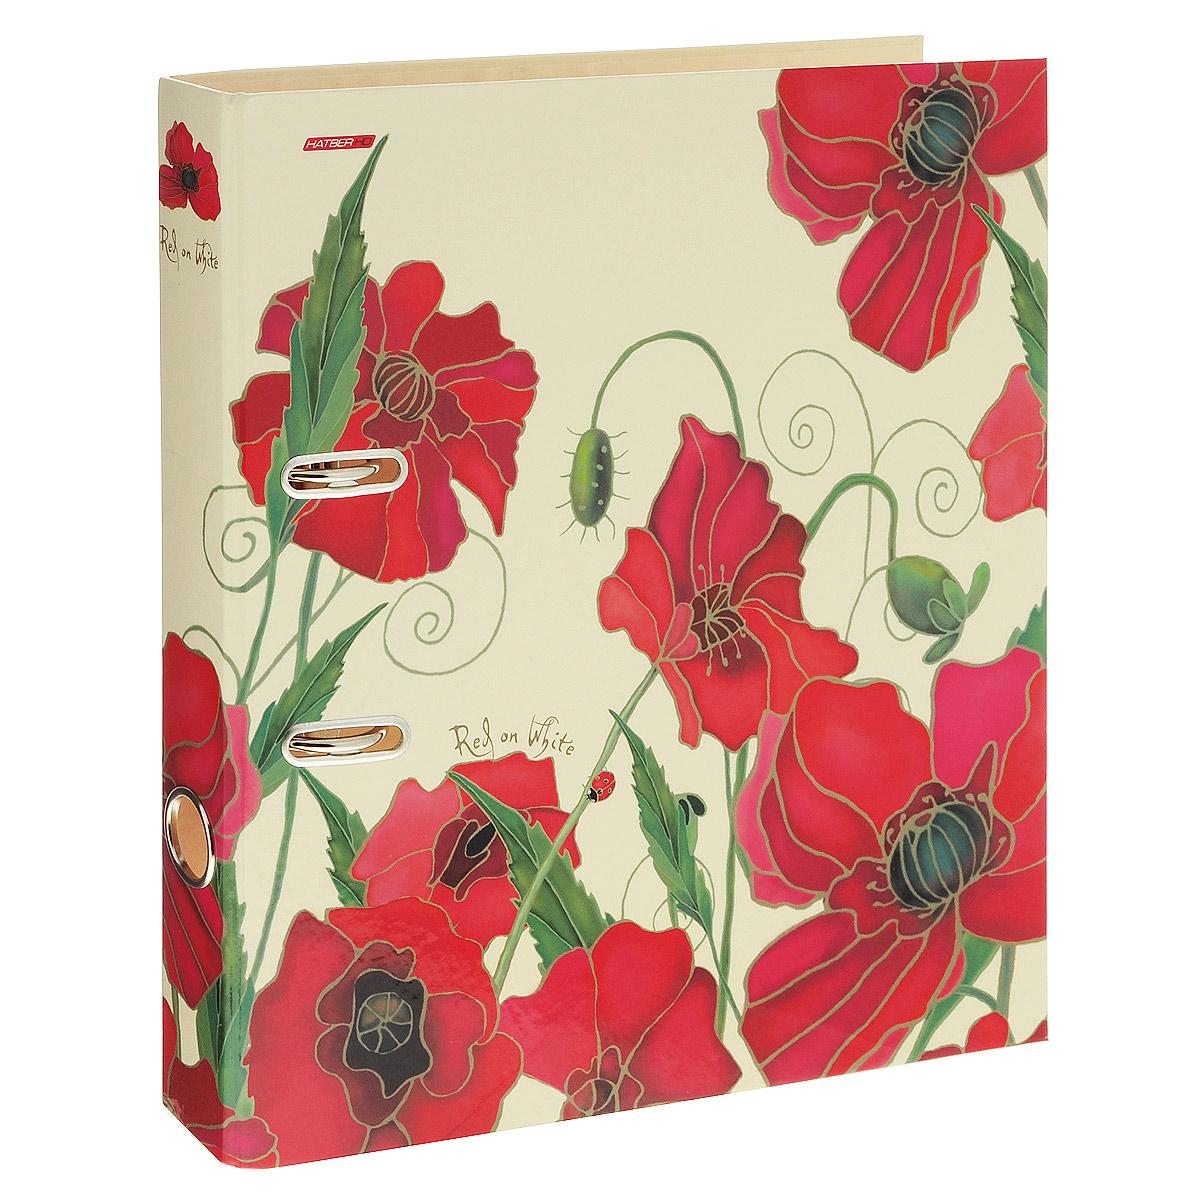 Папка-регистратор Hatber Red on White, ширина корешка 45 мм, цвет: бежевый, красный фискальный регистратор атол fprint 22птк без фн white